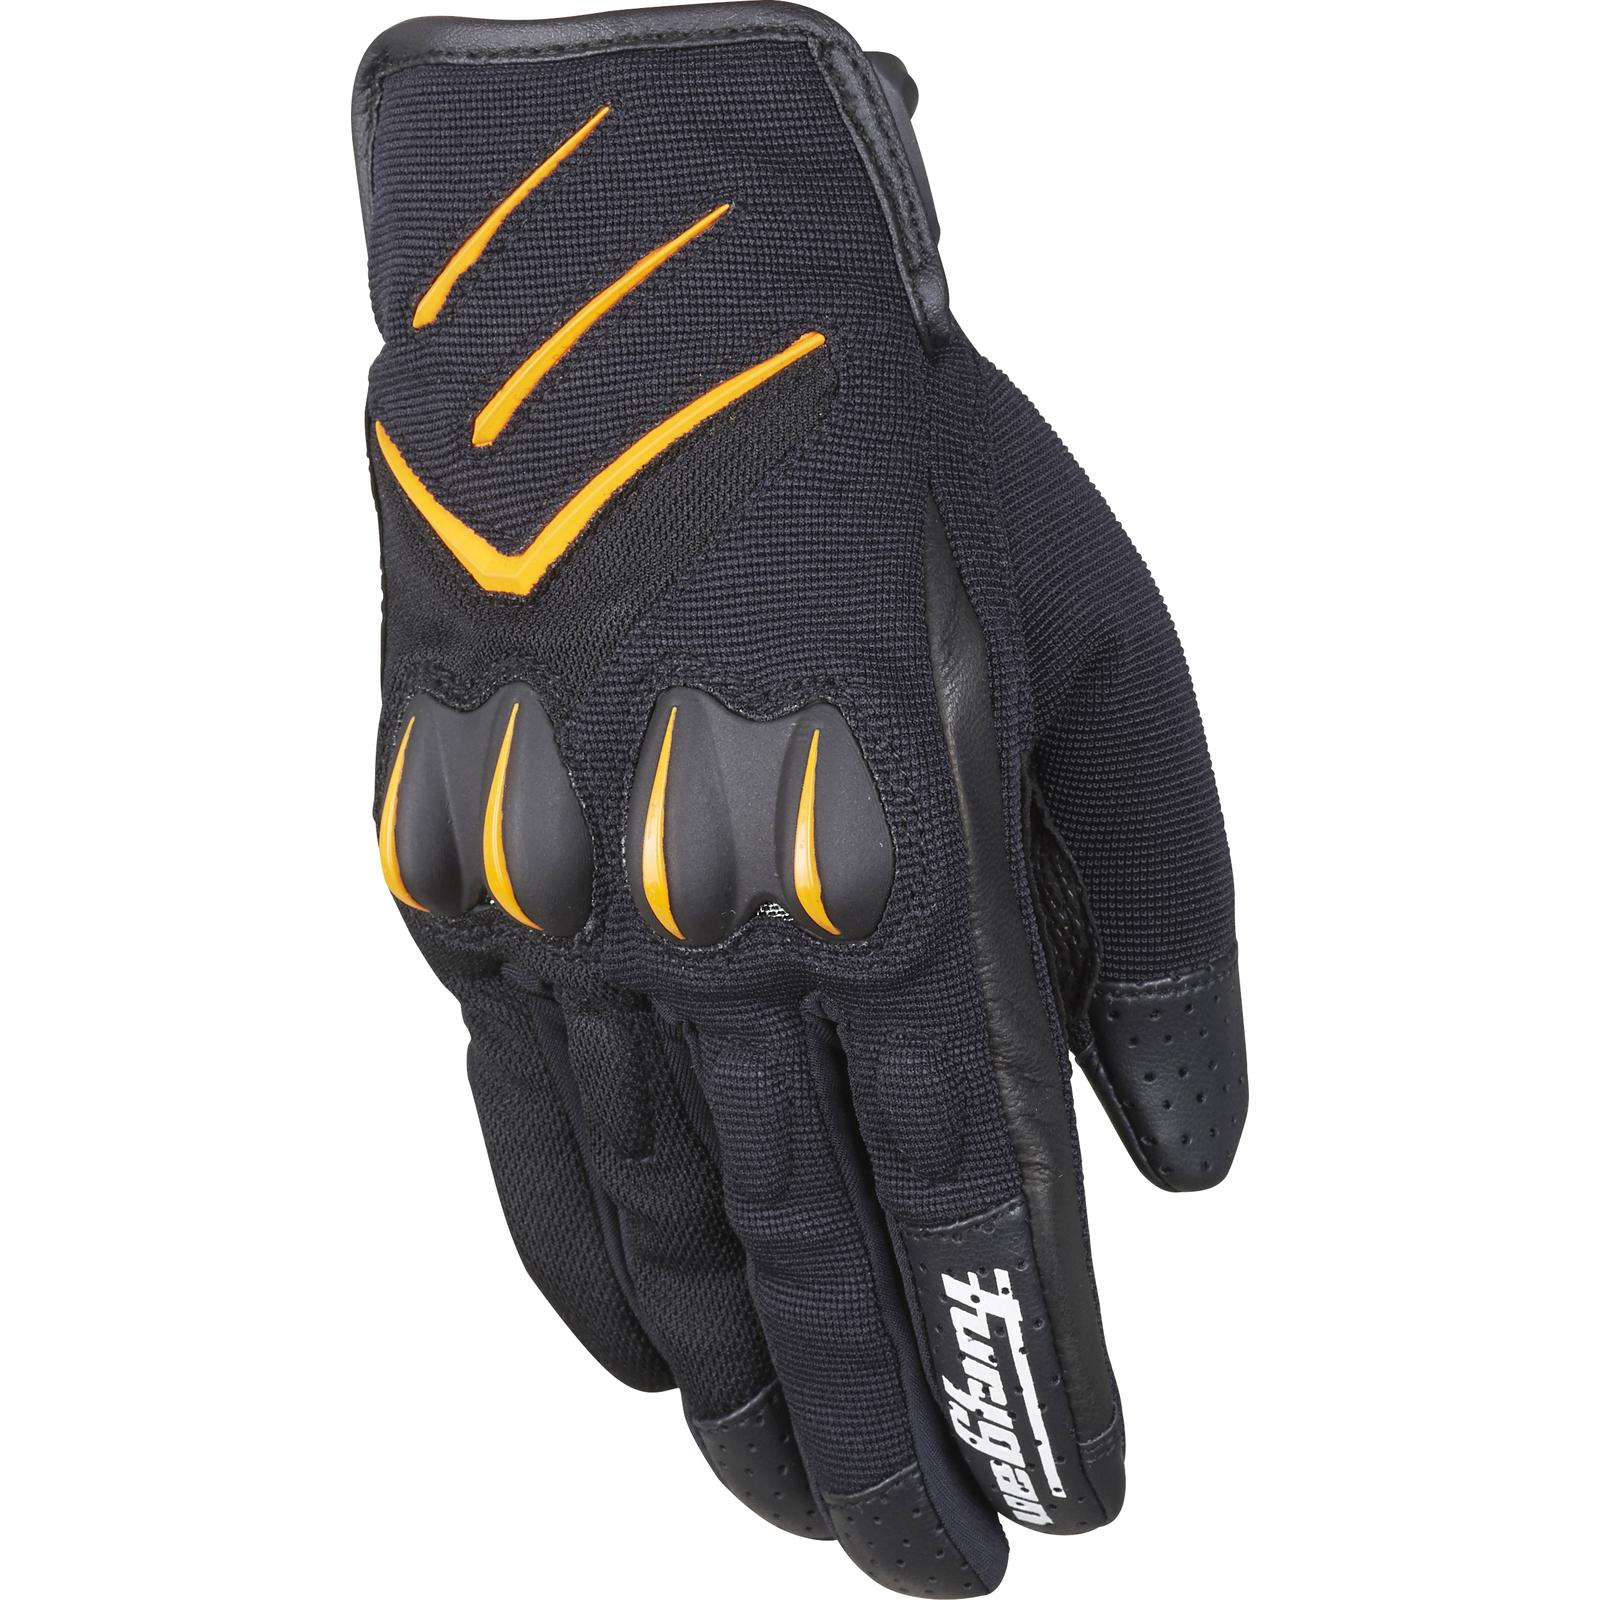 Mens gloves summer - Furygan Delta Motorcycle Gloves Textile Mens Summer Vented